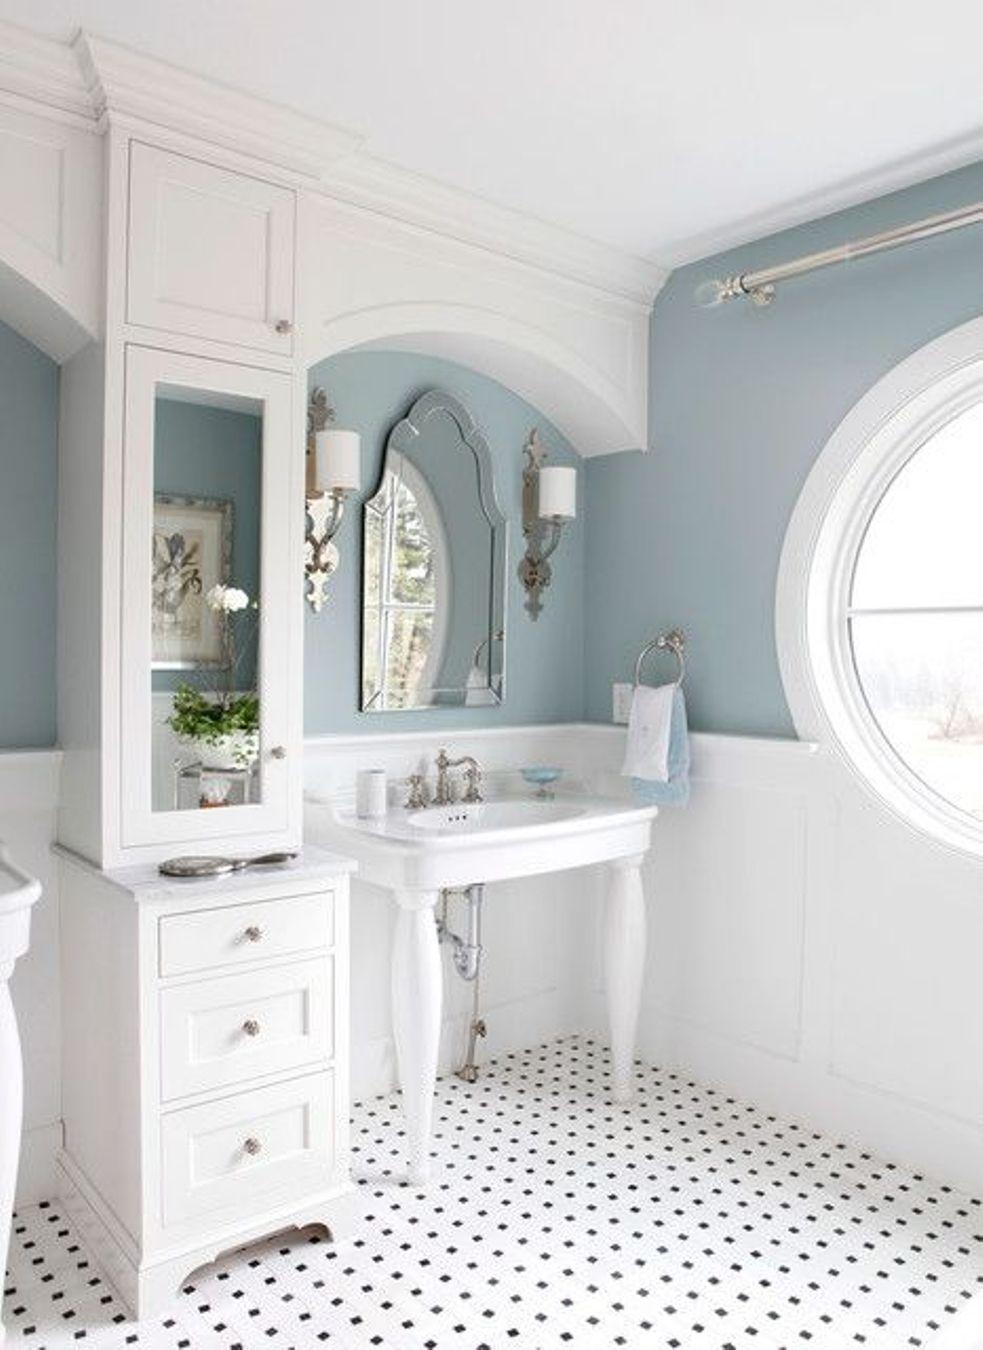 Bathroom Colors Popular Bathroom Paint Colors Popular Bathroom